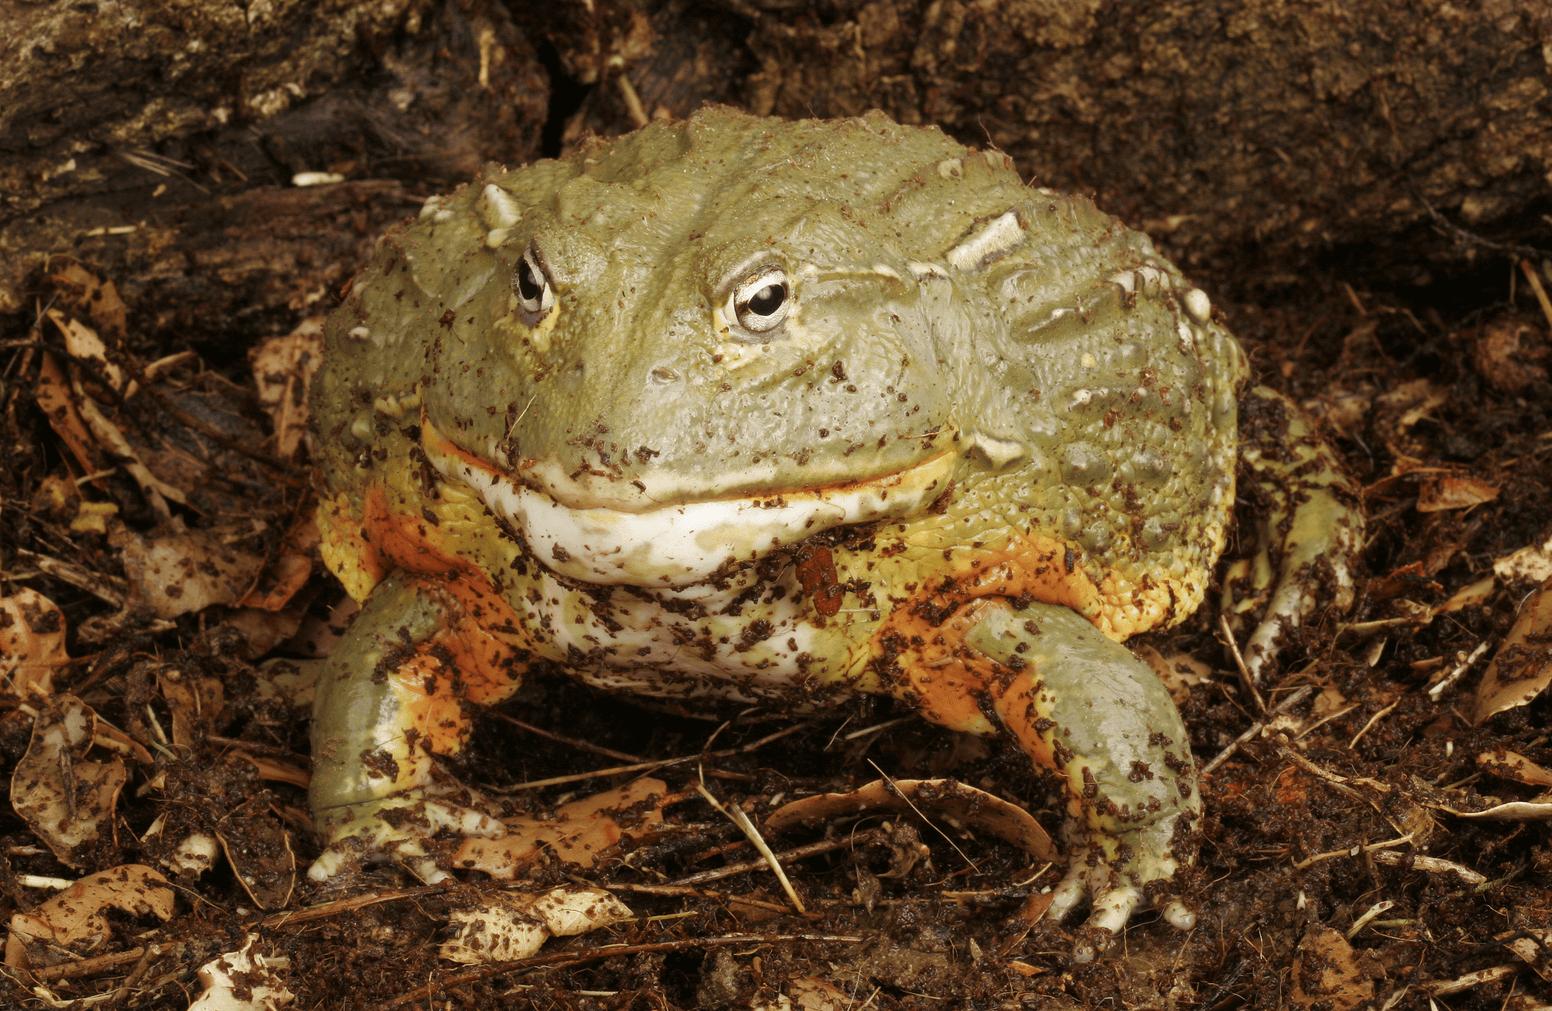 Pixie frog care sheet and captive husbandry tips.